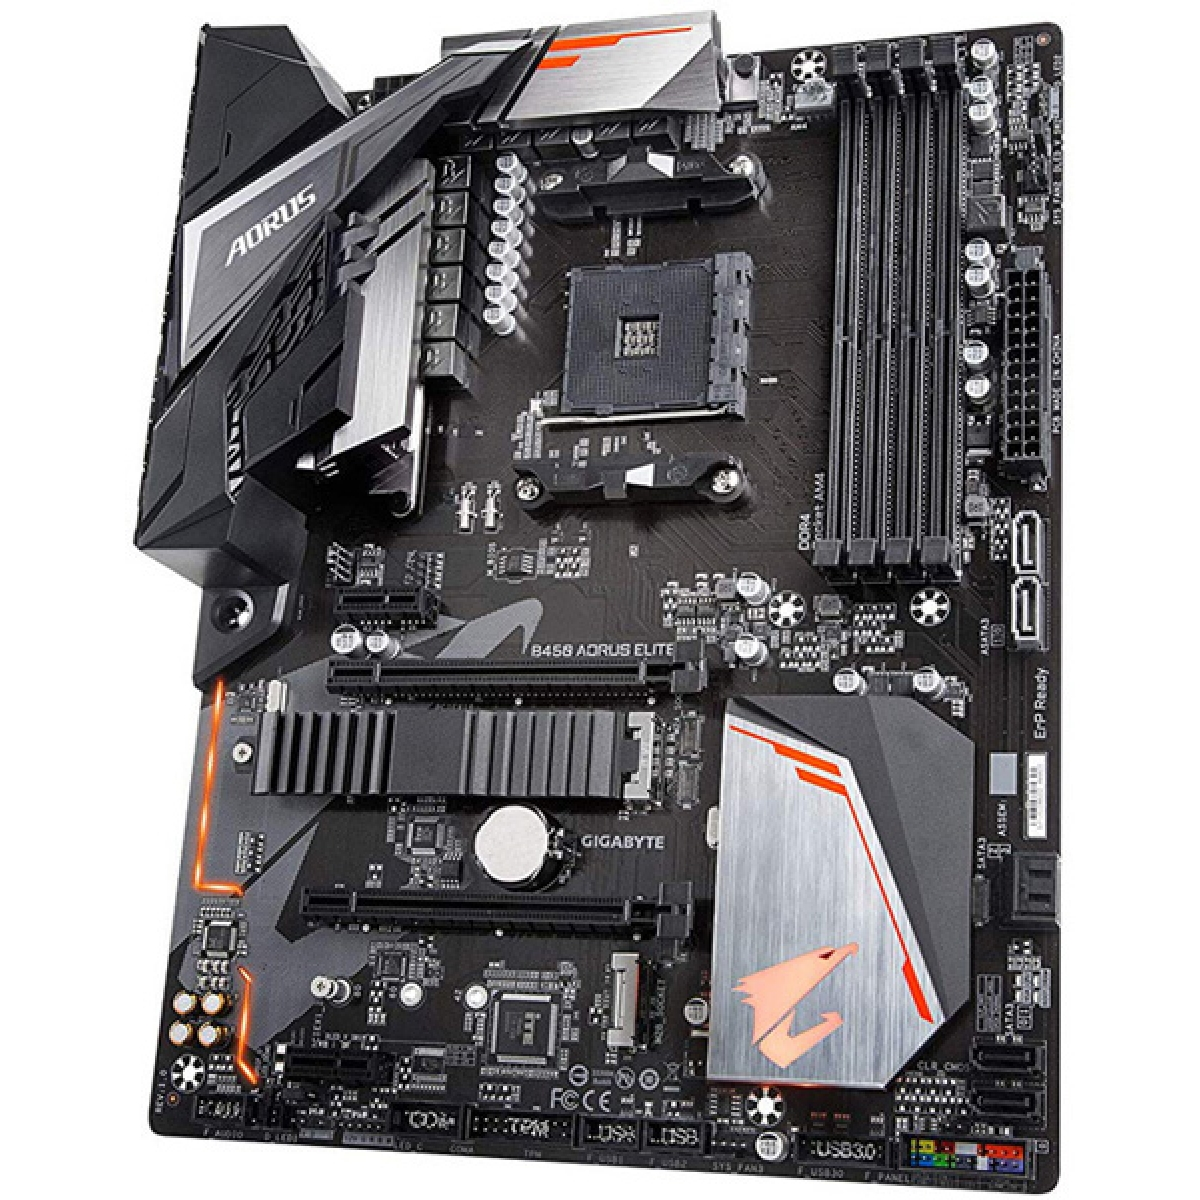 Placa Mãe Gigabyte B450 Aorus Elite, Chipset B450, AMD AM4, ATX, DDR4